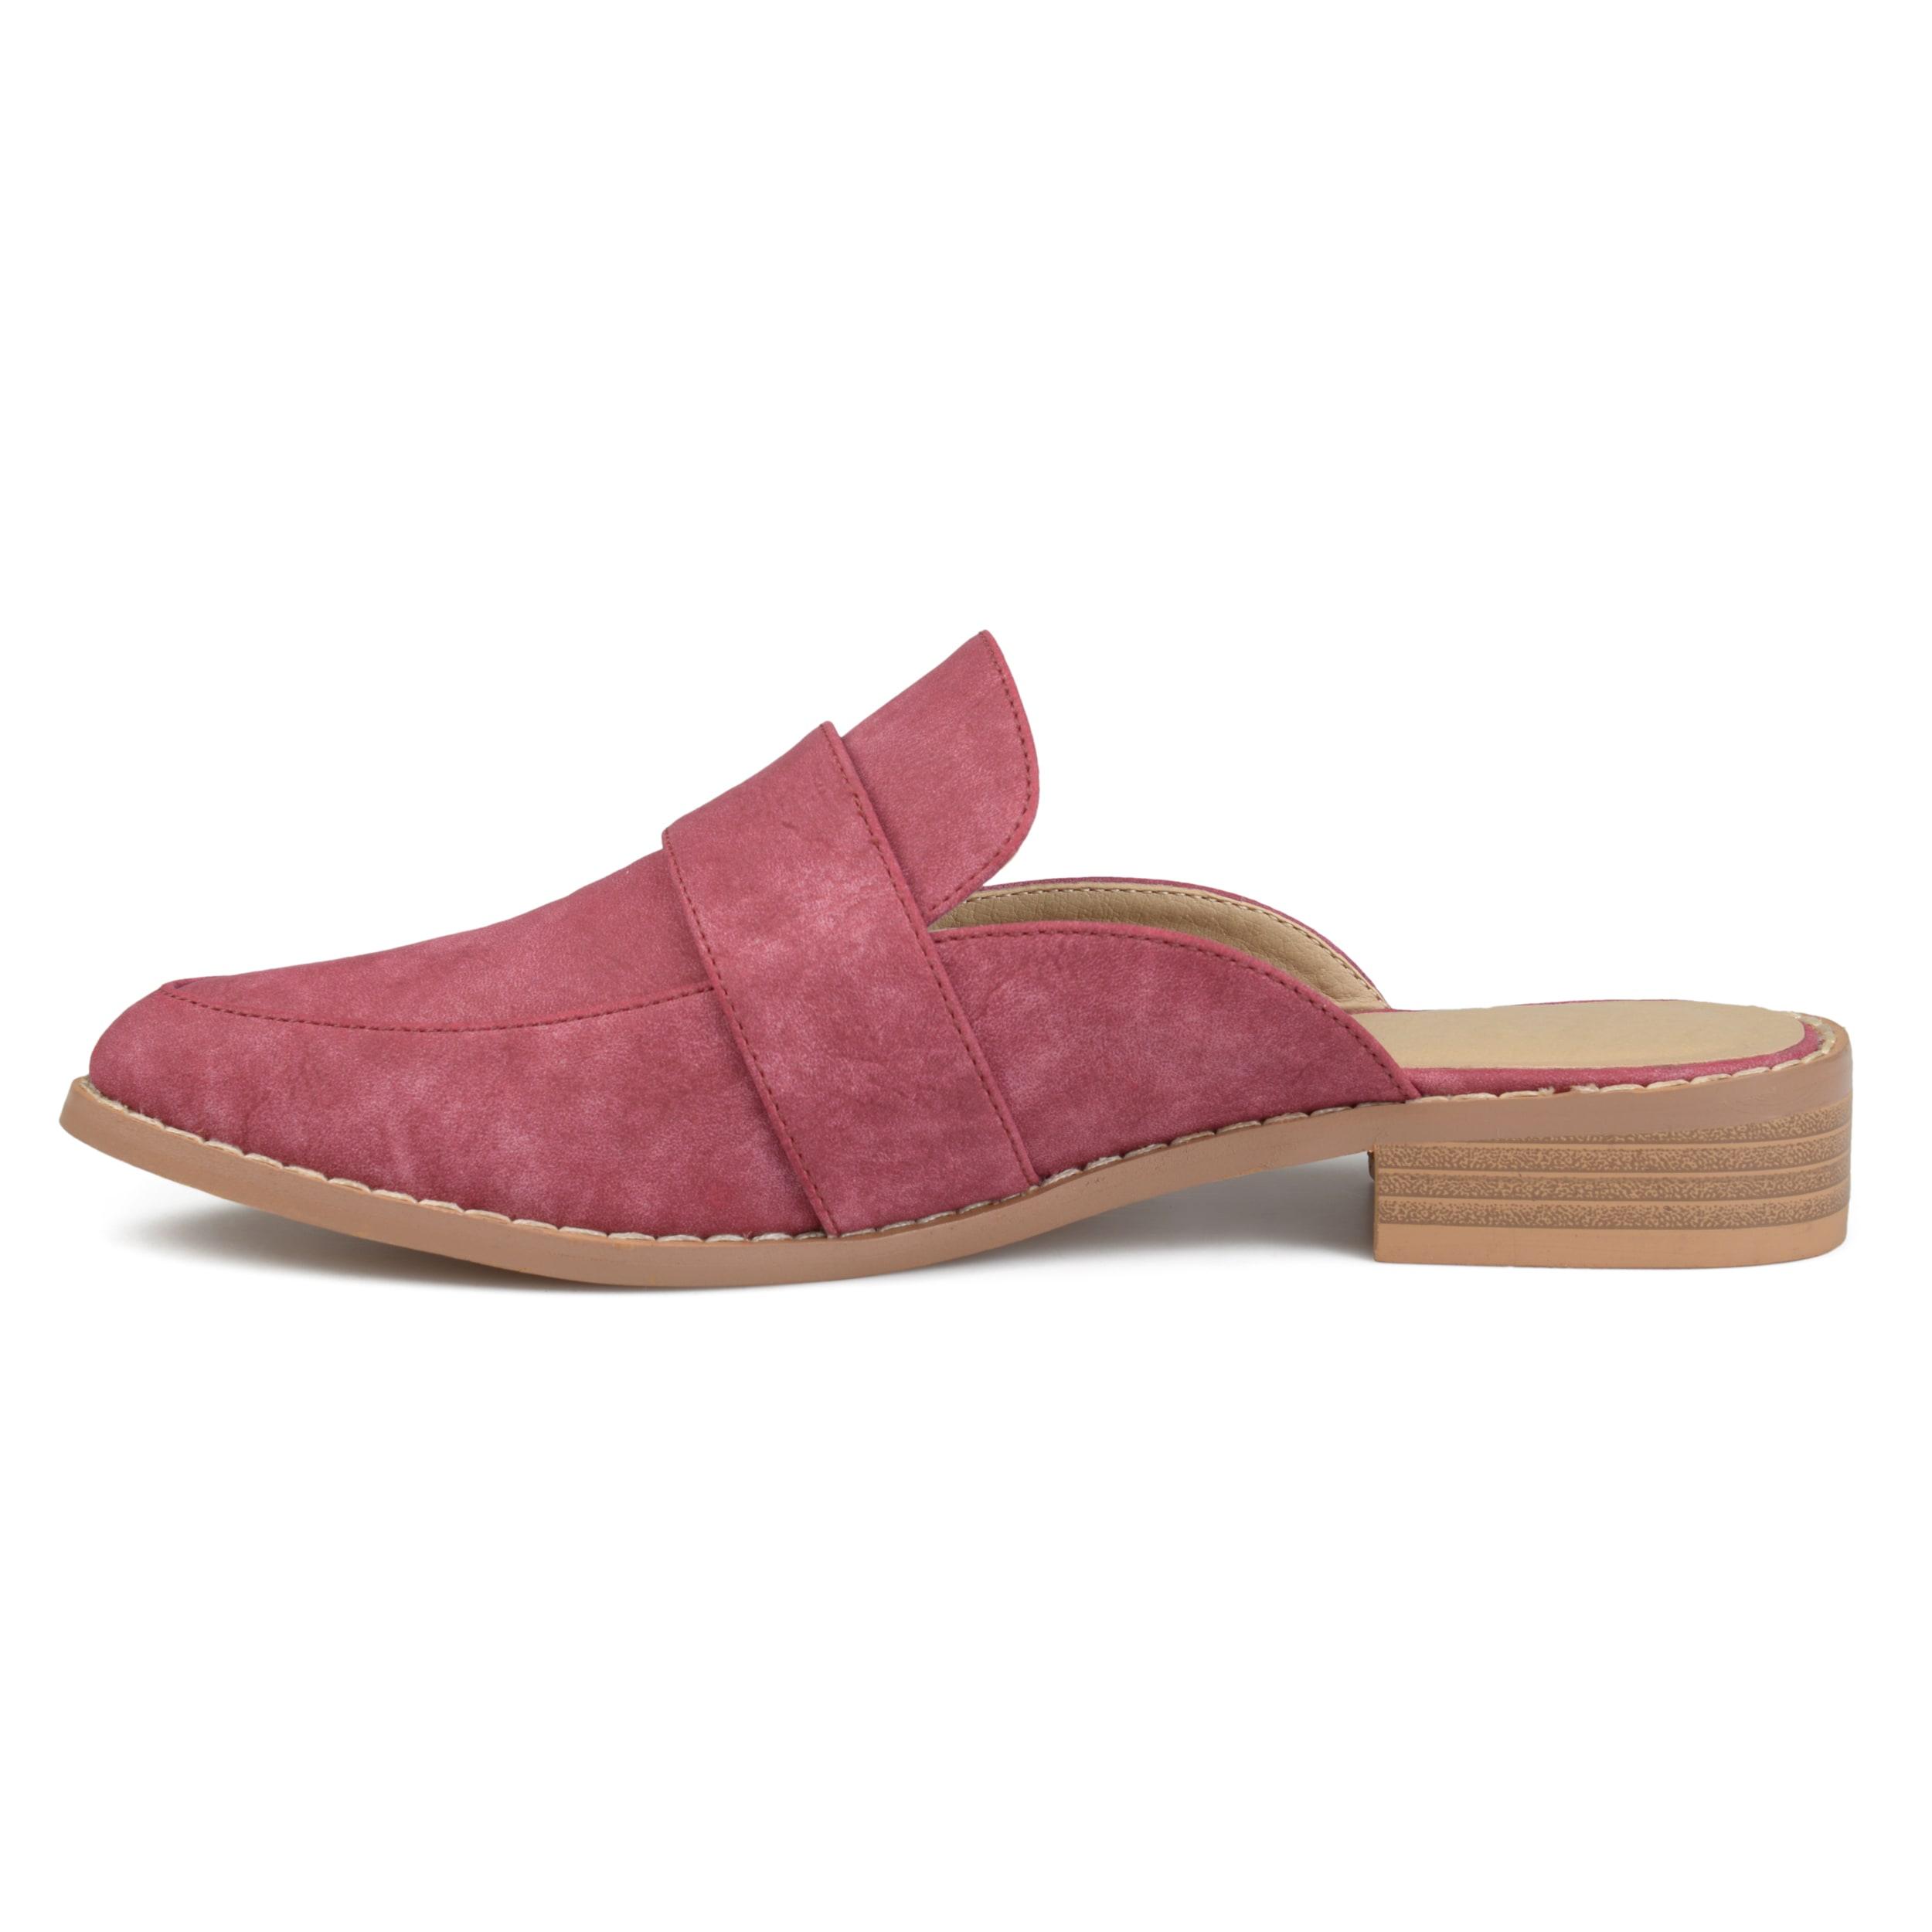 Journee-Collection-Women-039-s-039-Keely-039-Almond-Toe-Slip-on-Mules thumbnail 10